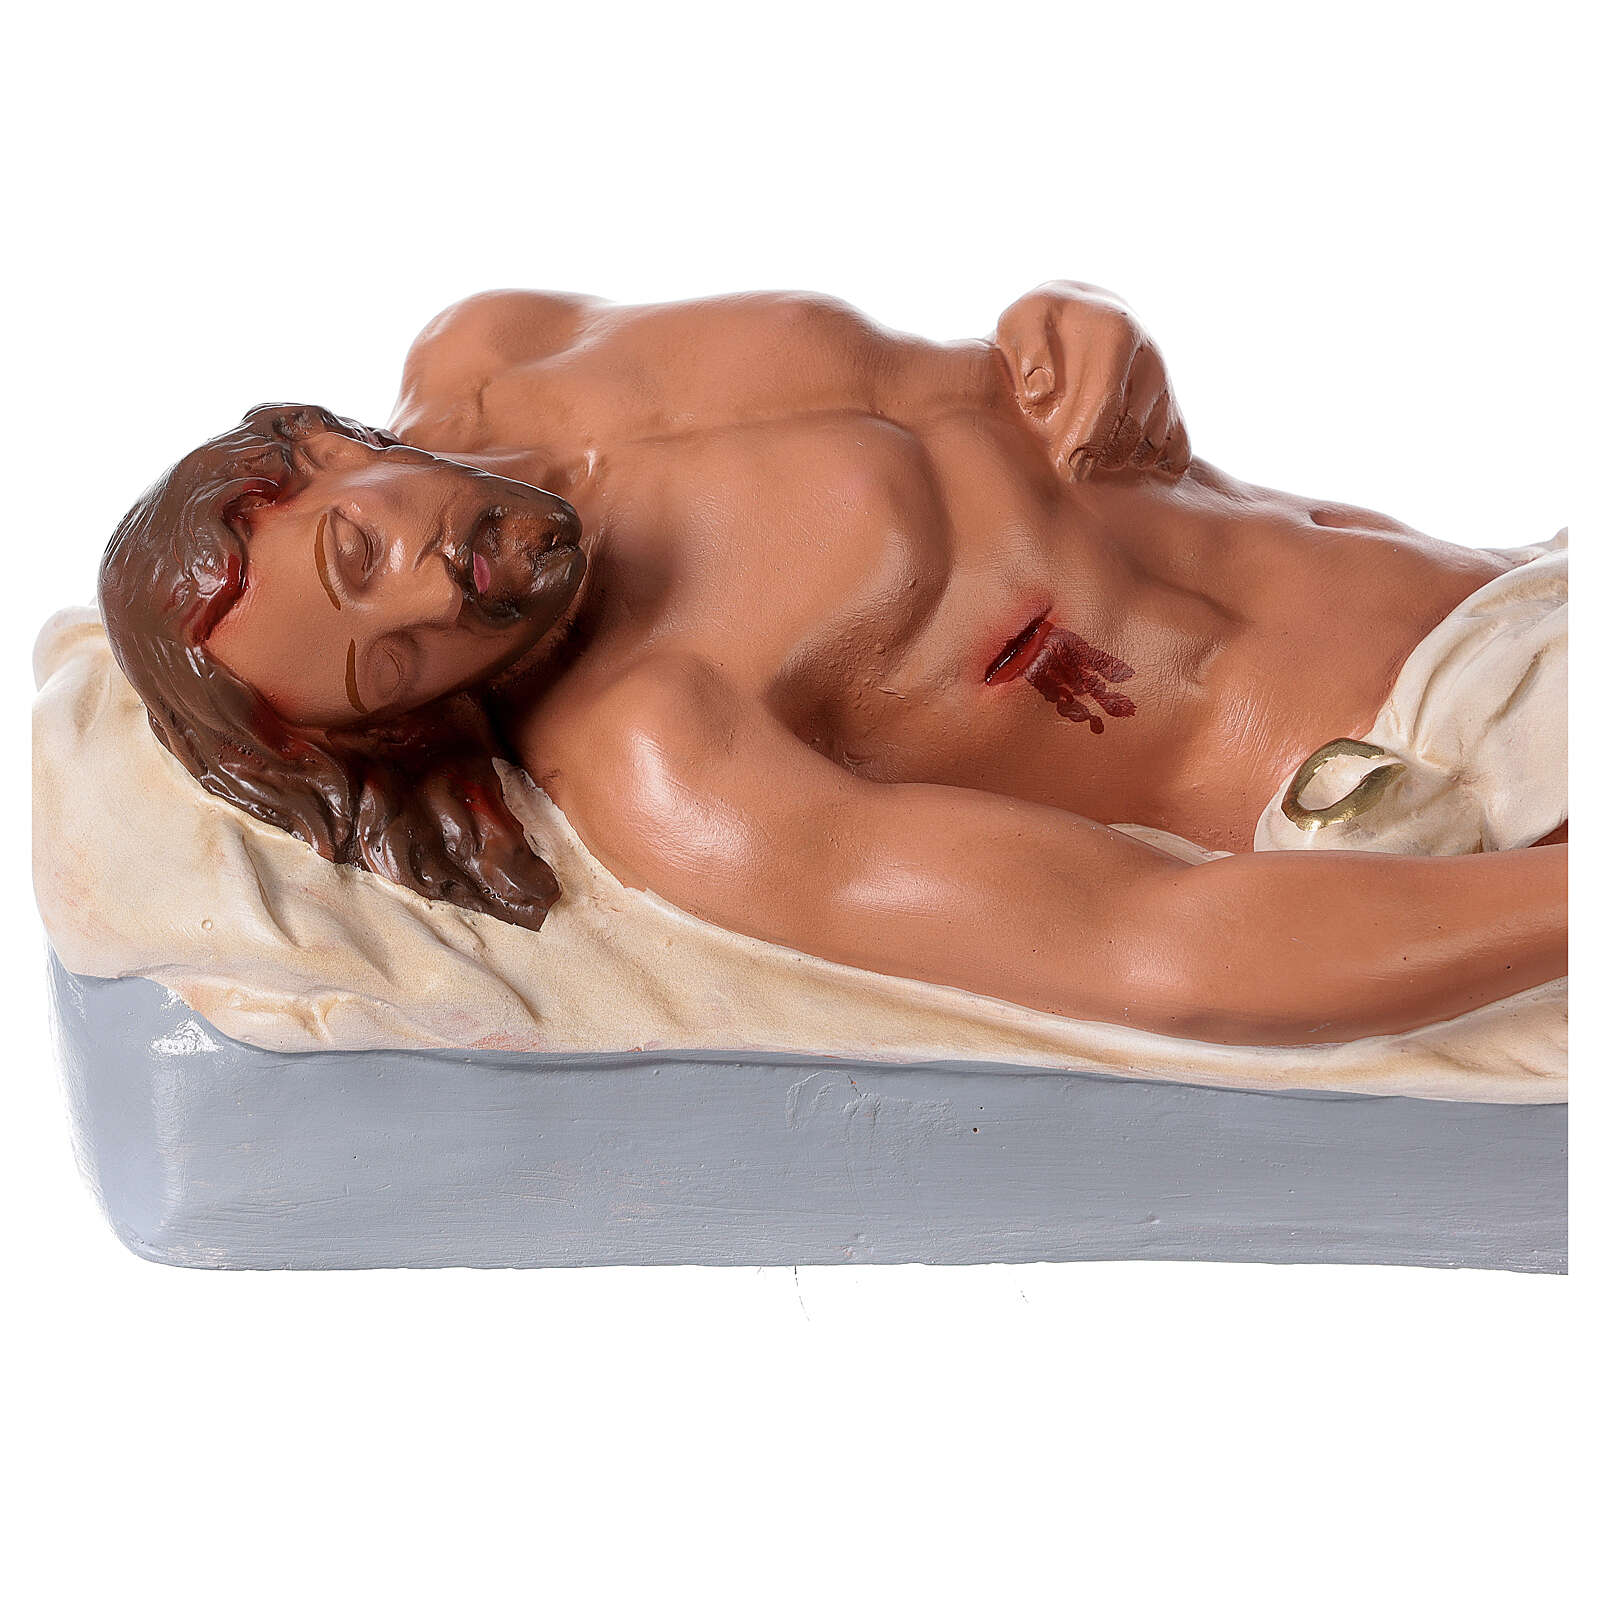 Dead Christ plaster statue 6x18 in hand-painted Arte Barsanti 4